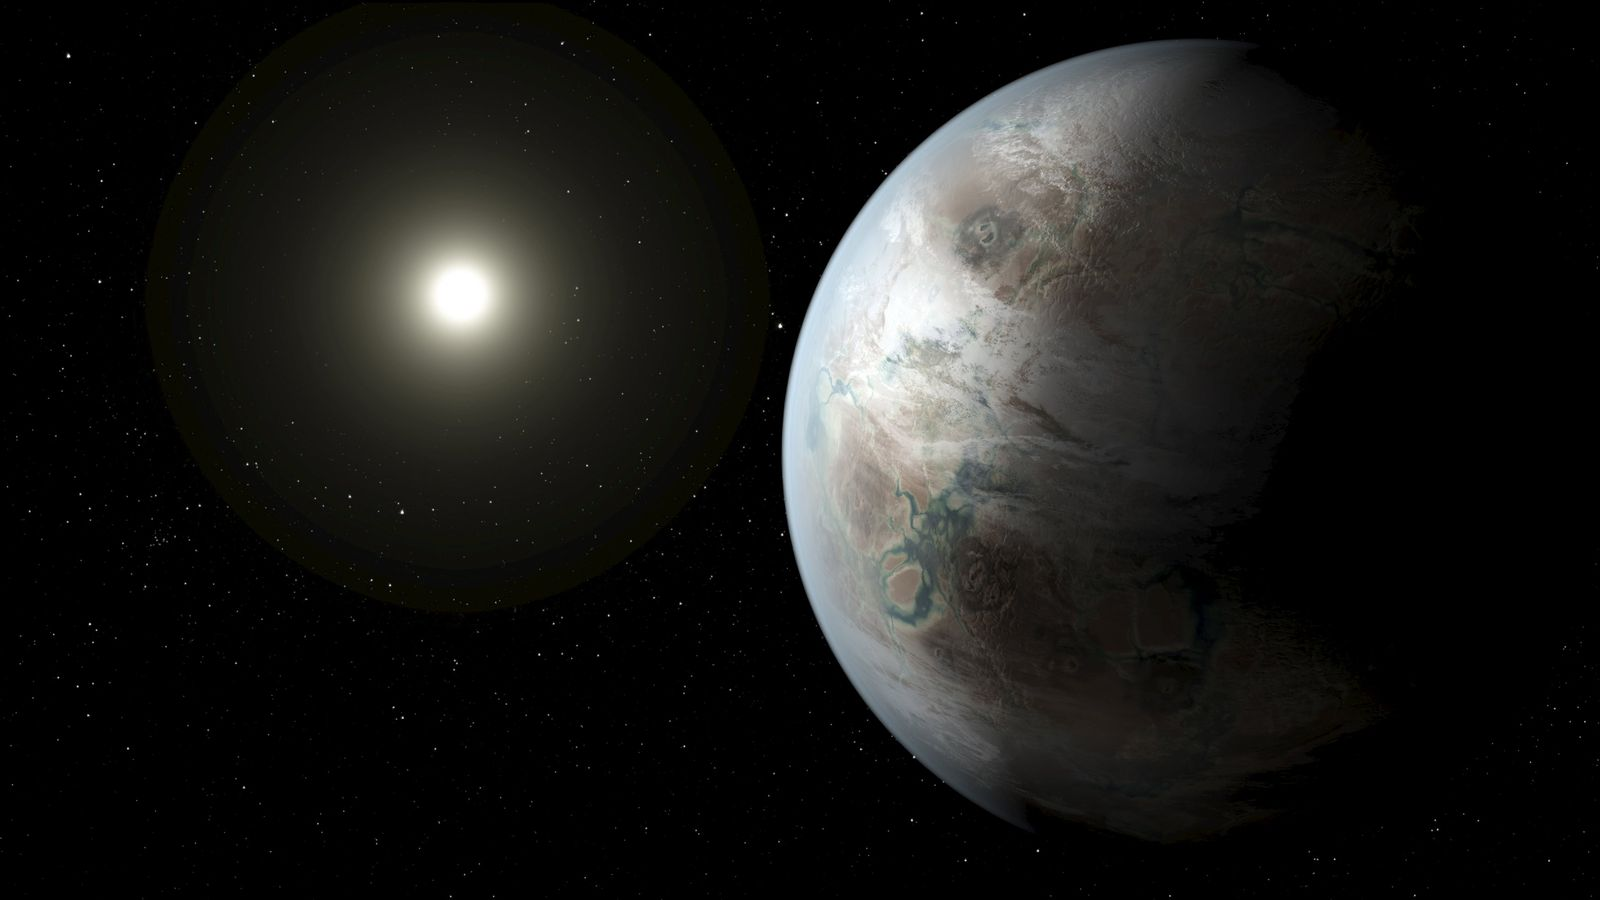 SPACE-NASA/PLANET